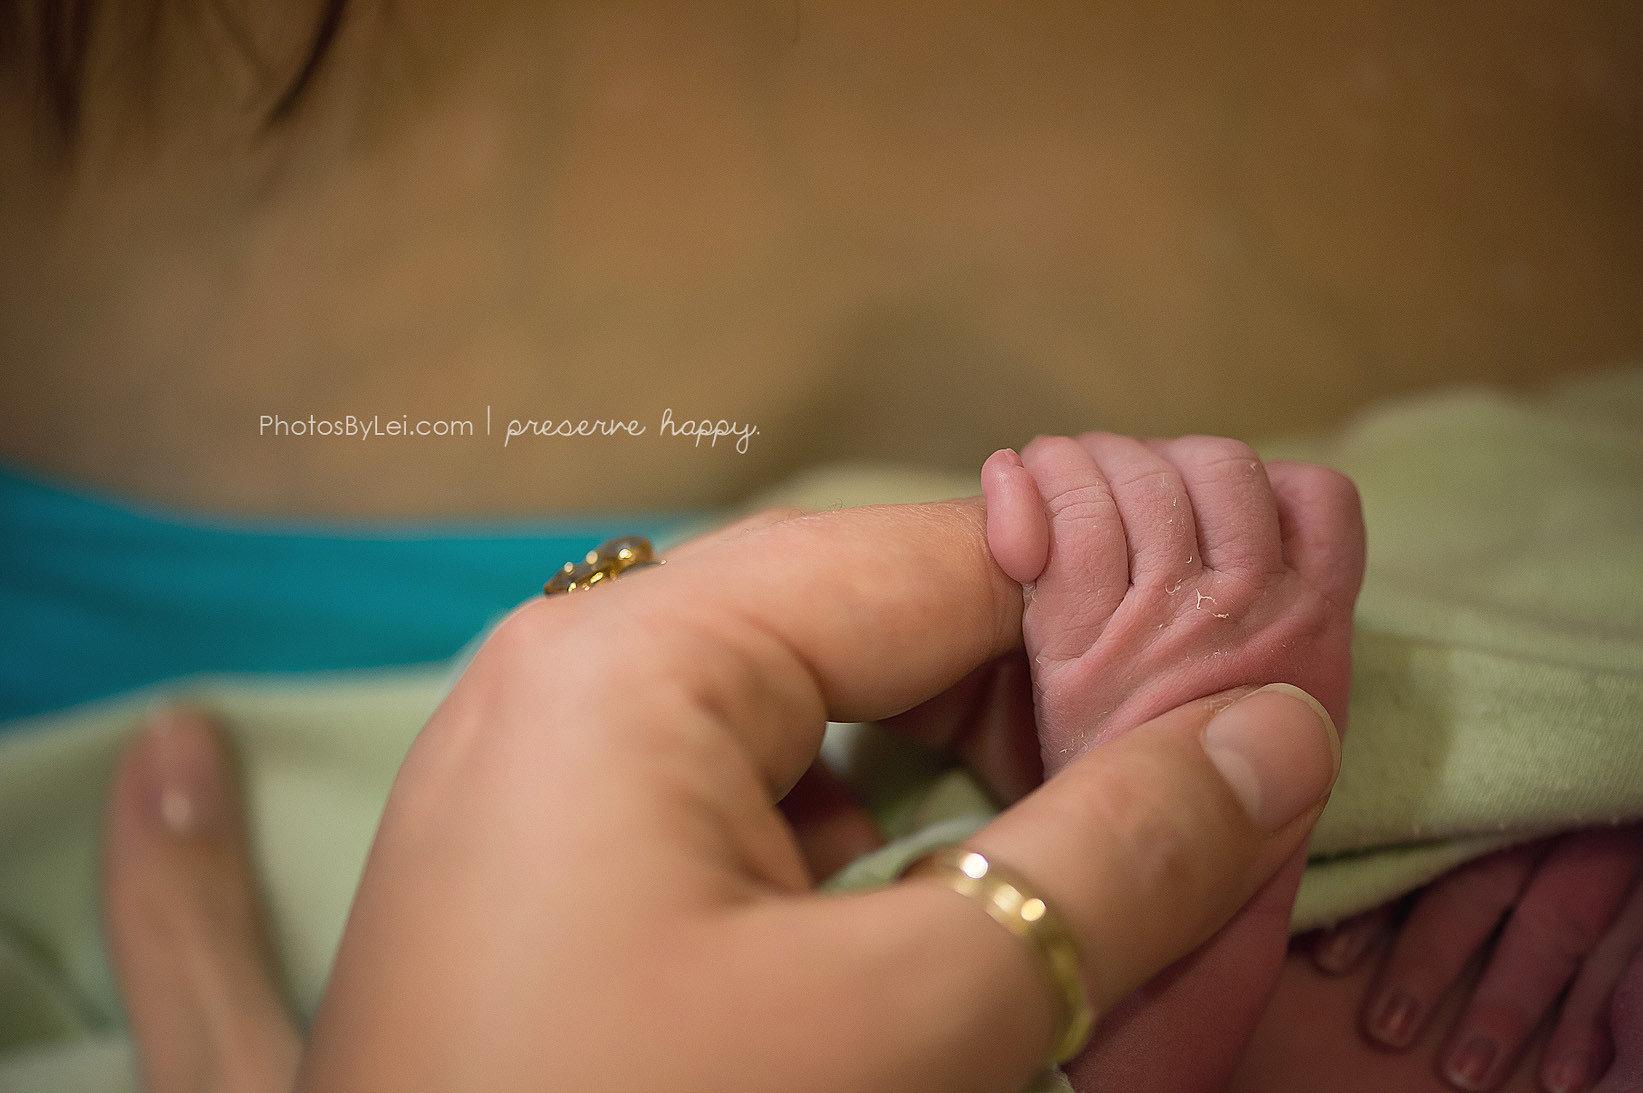 Those eyes finger surprise xxx :-)